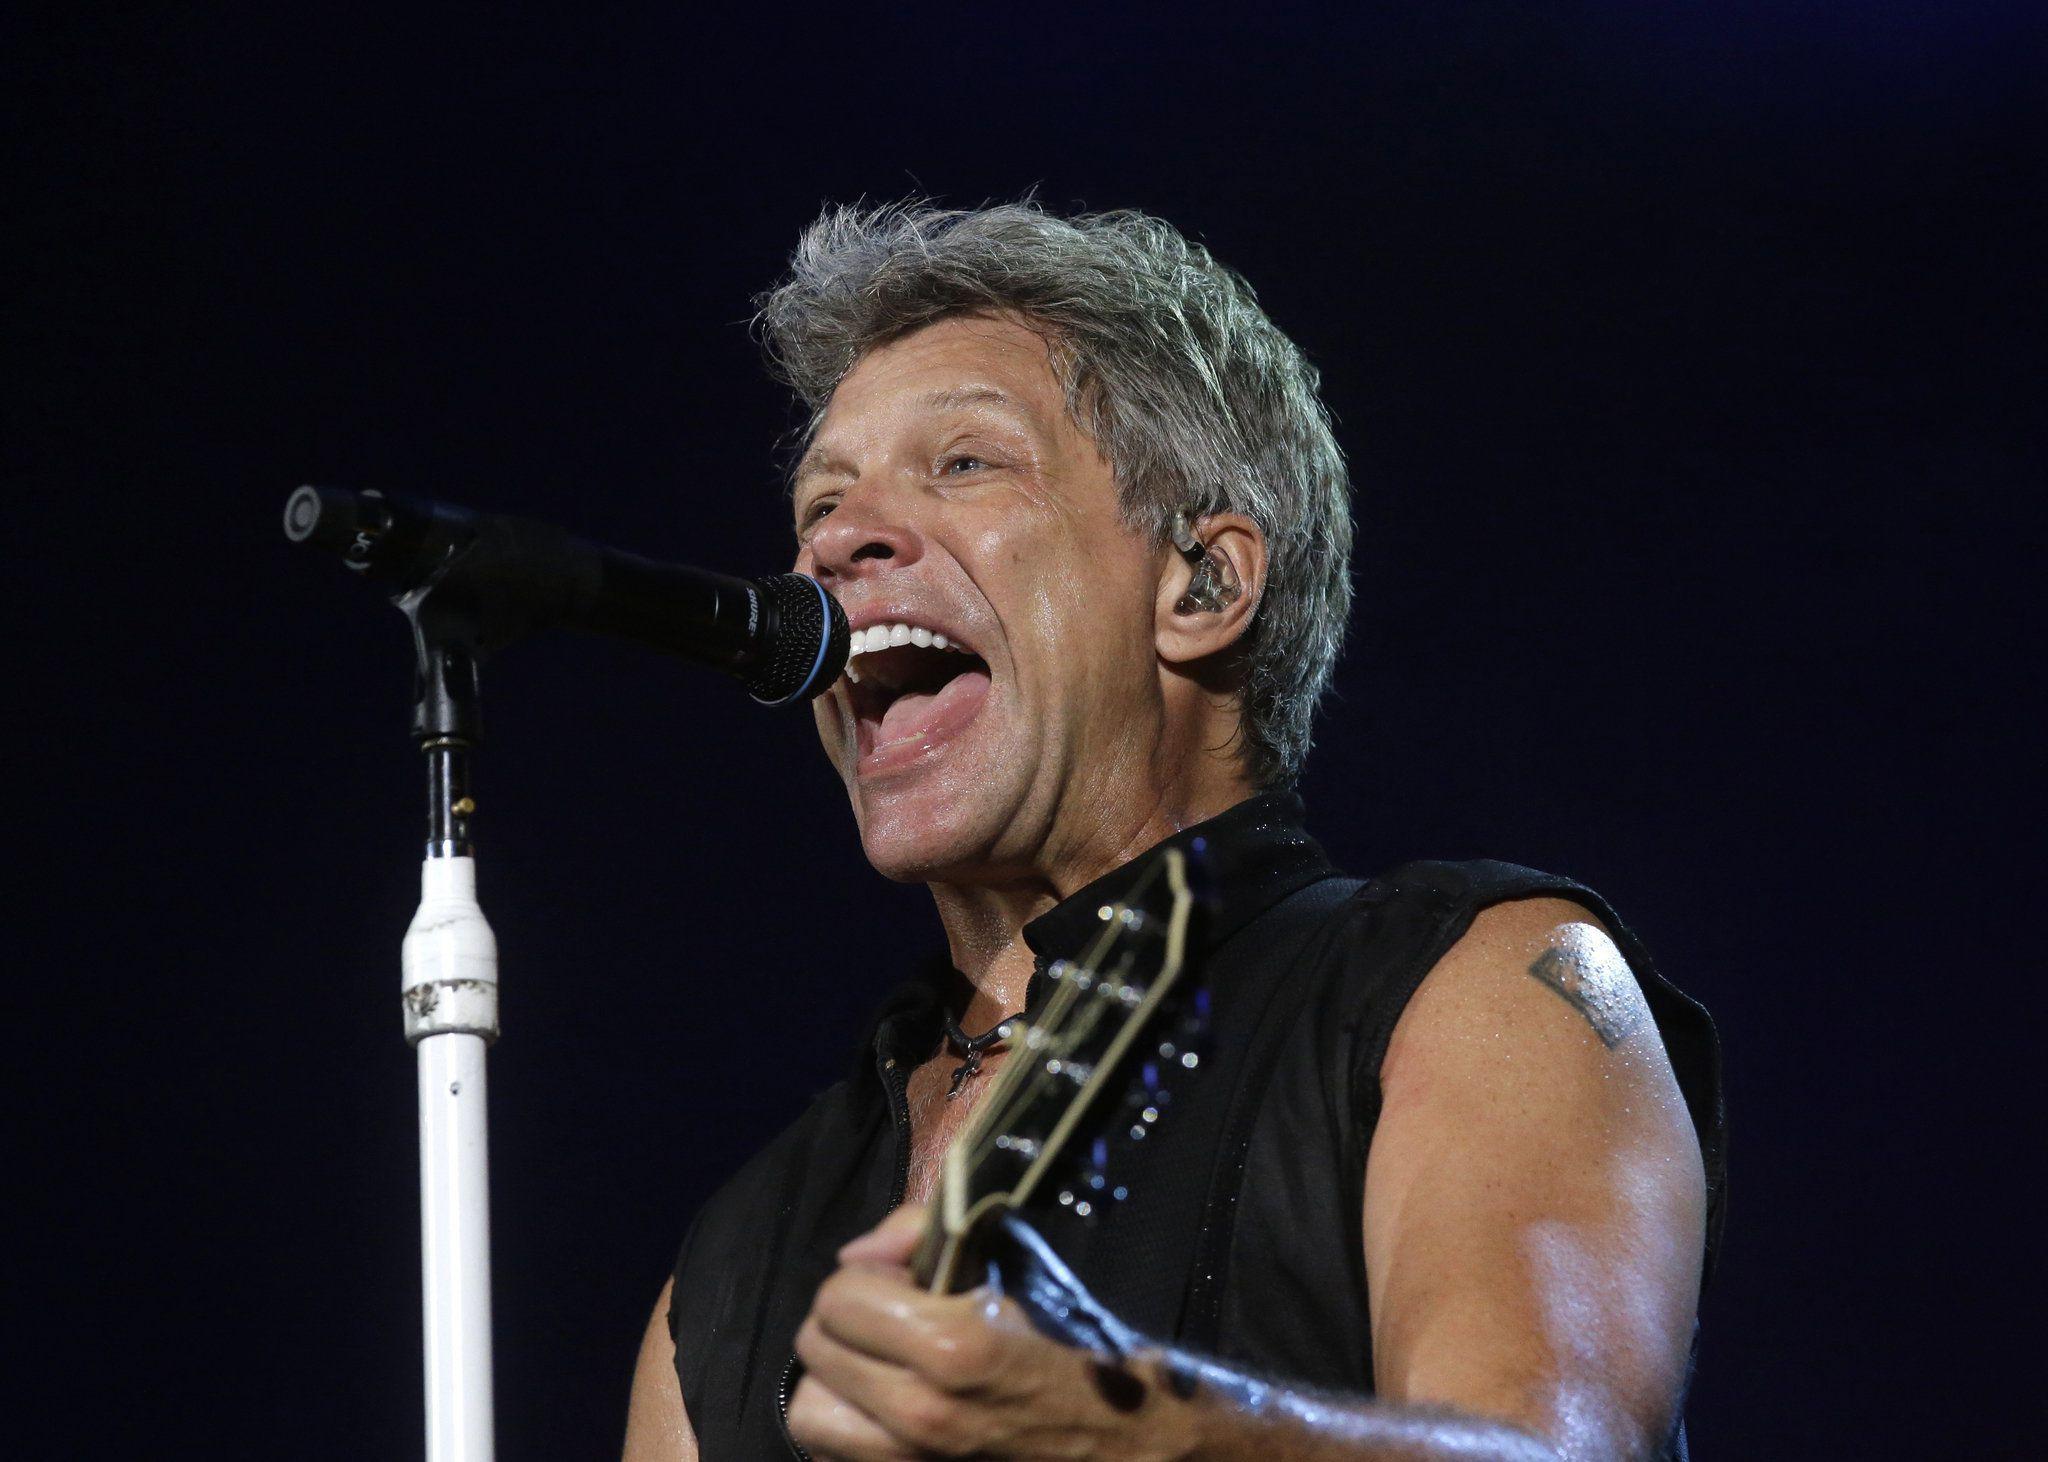 Bon Jovi Hd Wallpaper